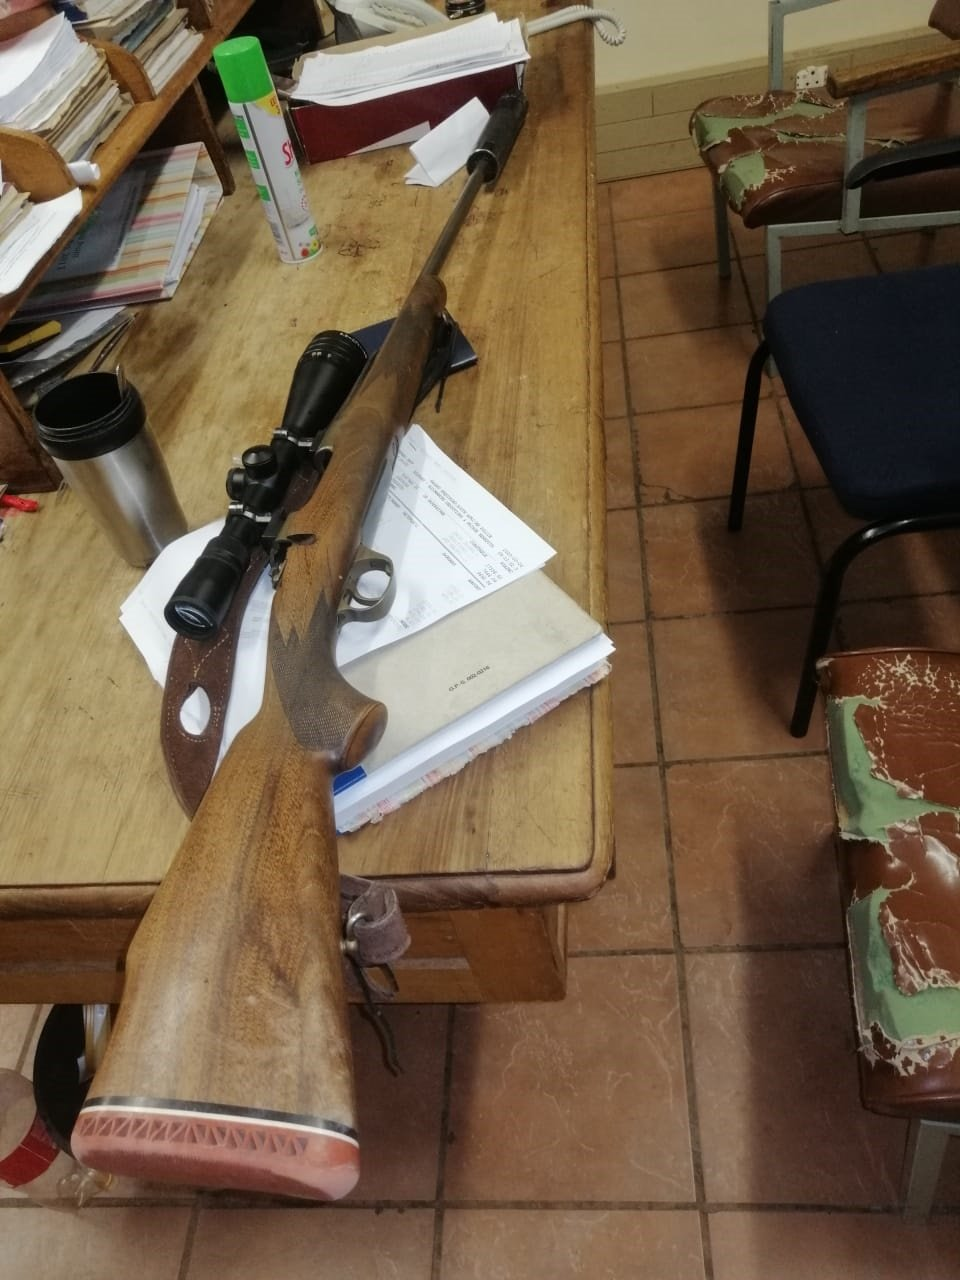 Five men were arrested for allegedly hunting illeg